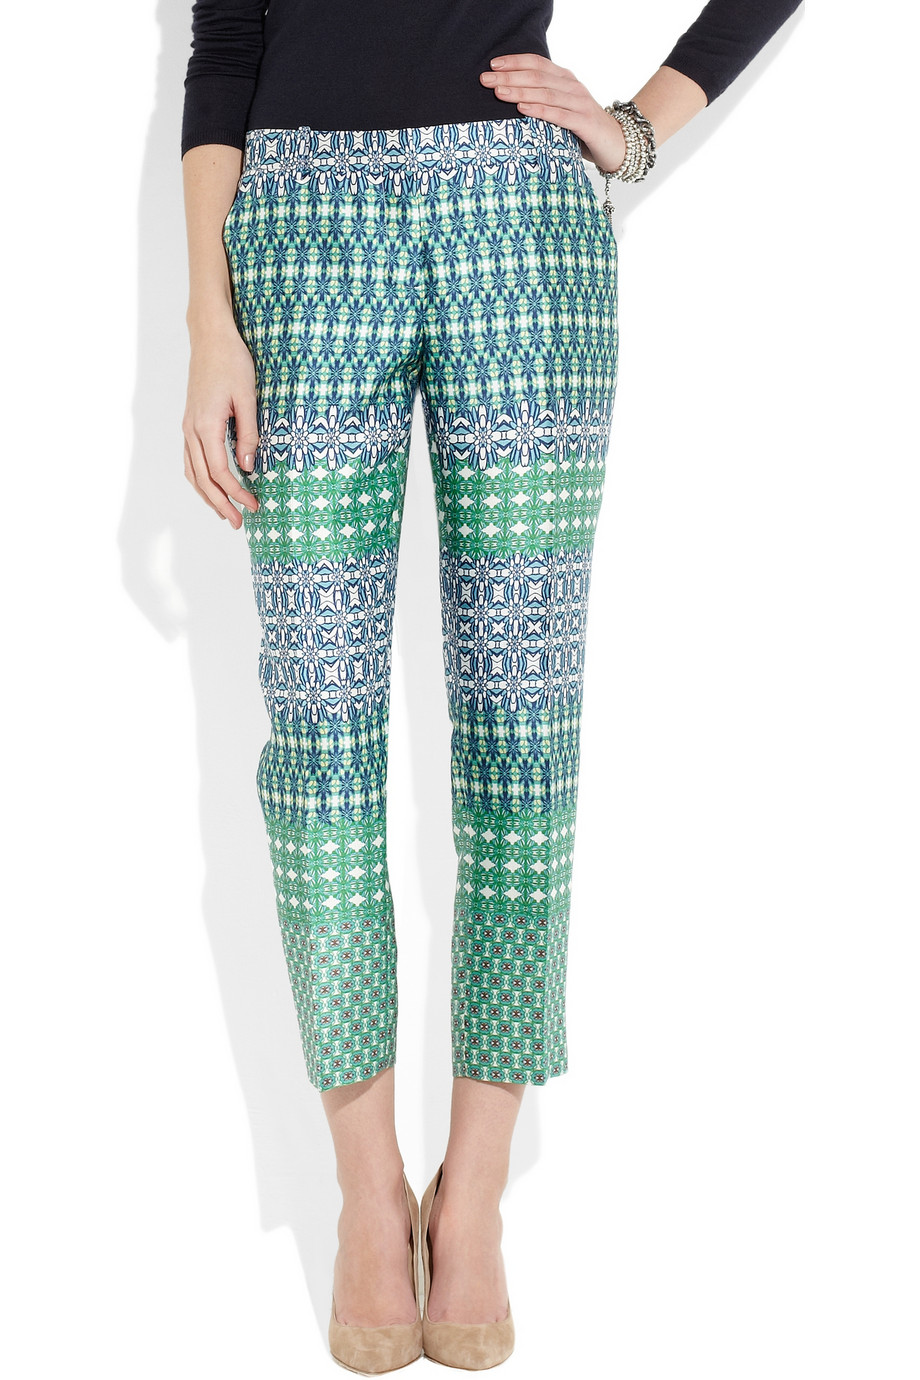 J.crew Café Printed Wool and Silk Blend Capri Pants | Lyst